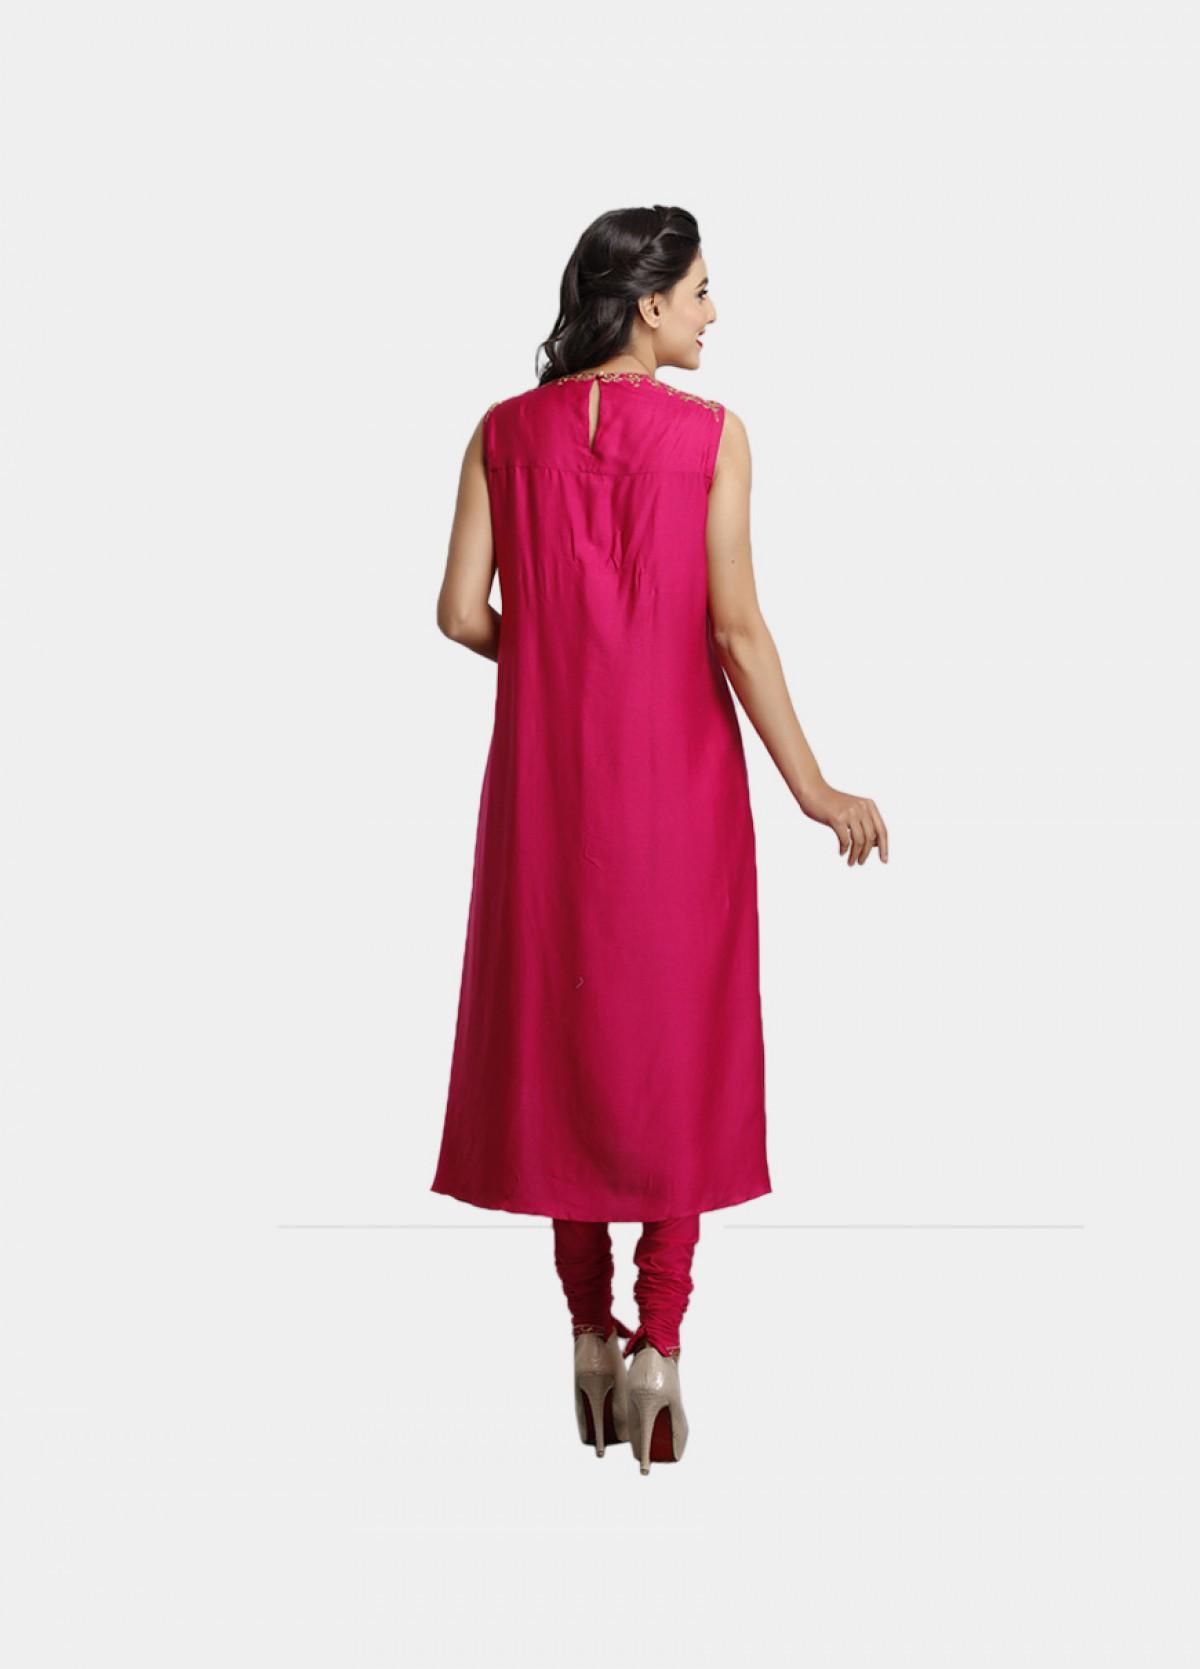 The Pink Magenta Modal Kurta Bottom Dupatta Set